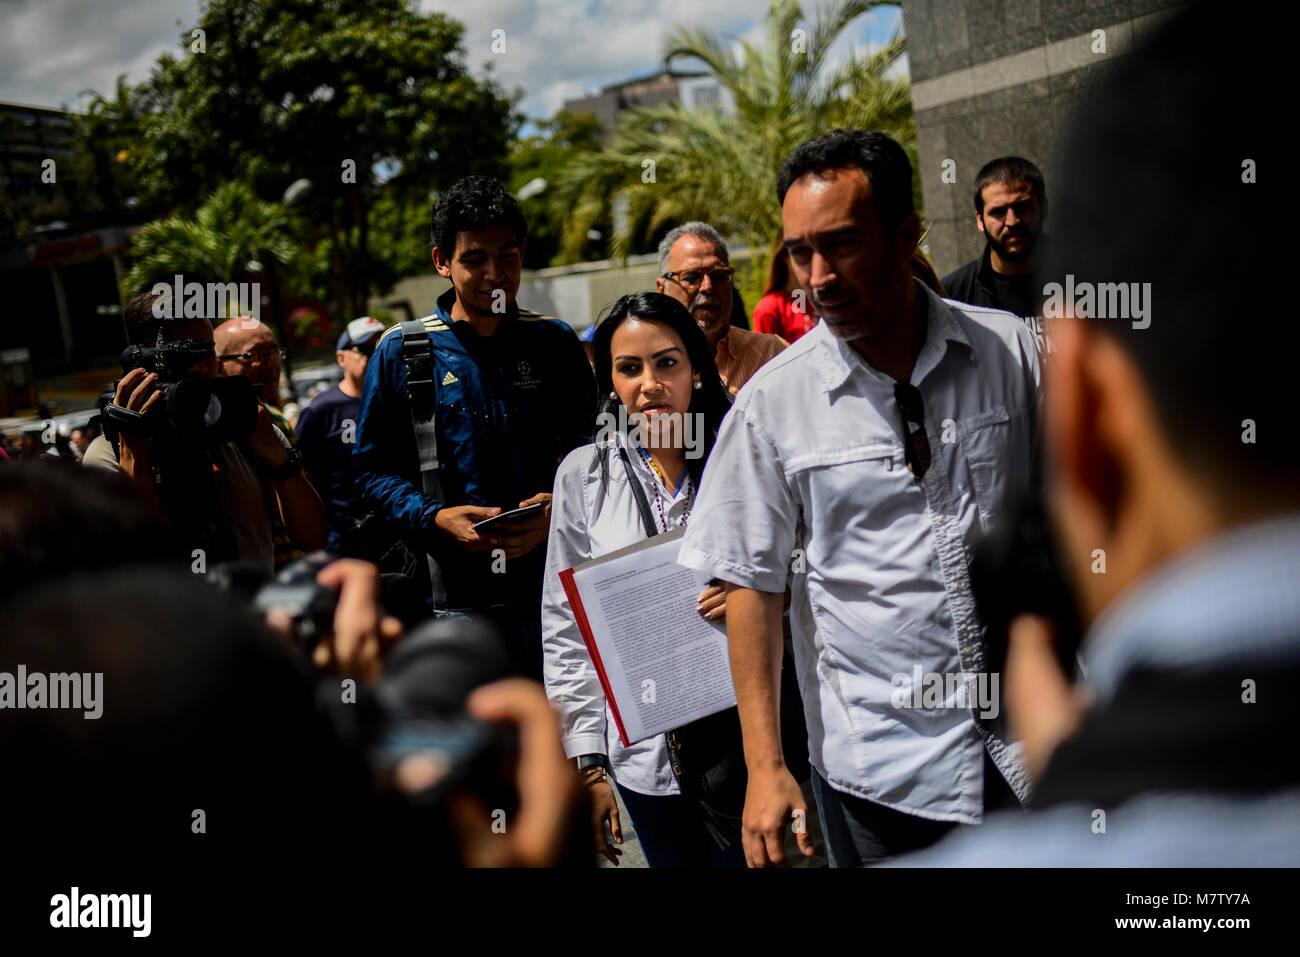 12 March 2018, Venezuela, Caracas: The delegate Delsa Solorzano (C) hands over a document to UN representatives - Stock Image